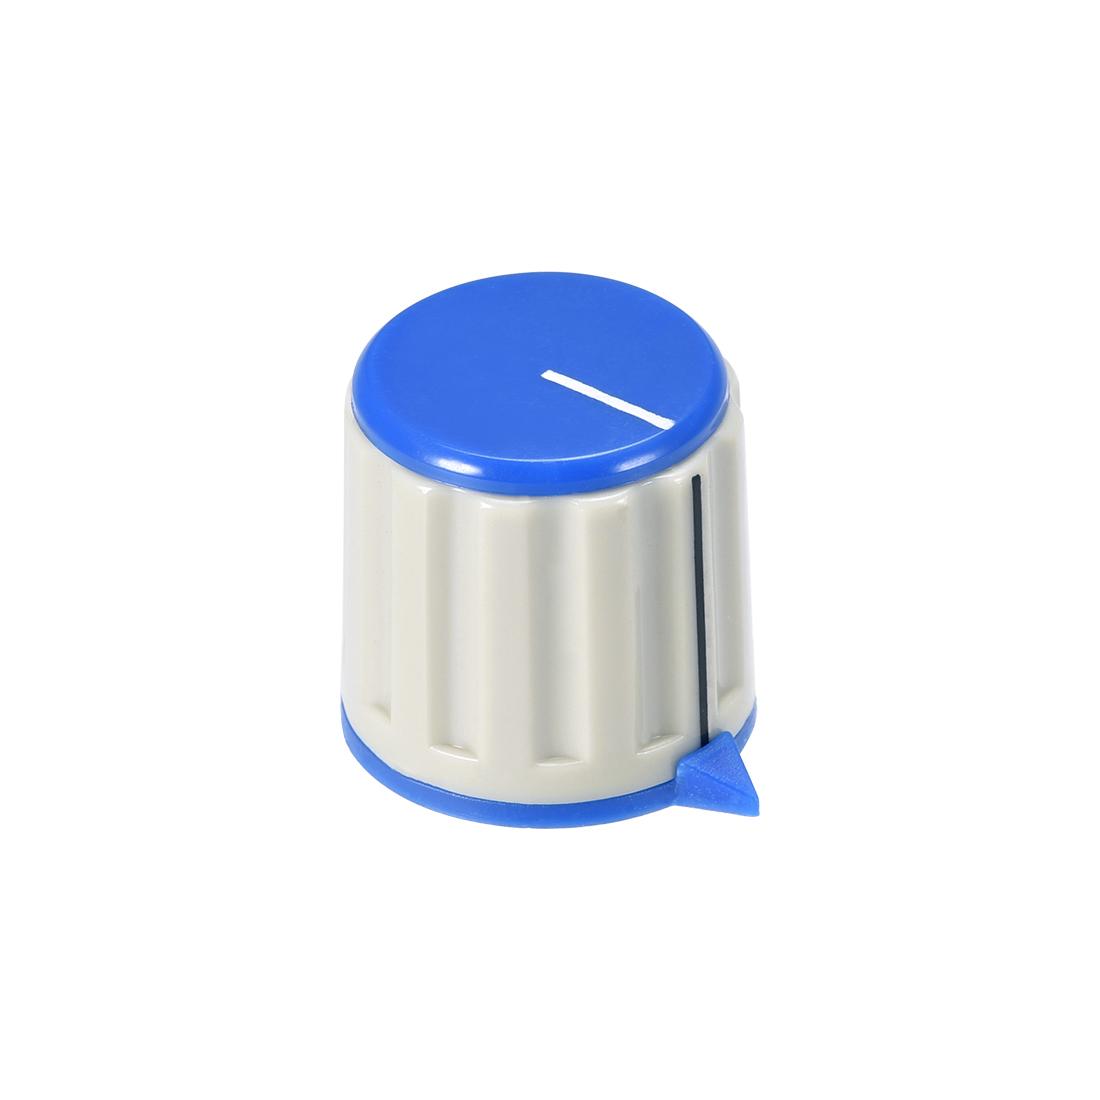 Plastic Potentiometer Rotary Knob 6mm Insert Shaft 21x21mm Blue Black